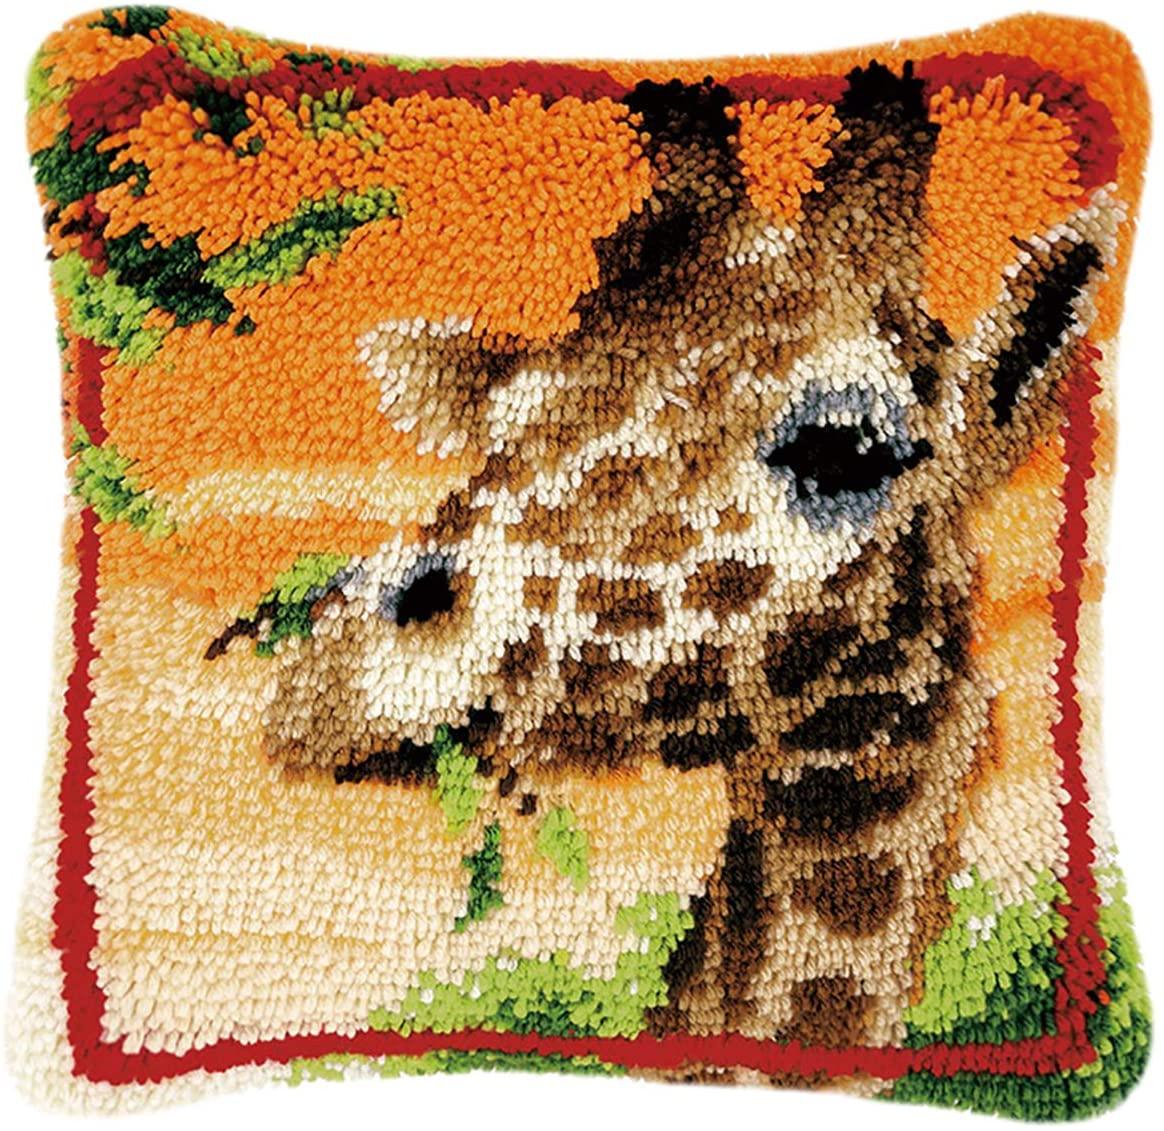 Latch Hook Cushion Kit Giraffe Eating Leaves Pillowcase Embroidery Starter Kits Cushion Cover for Home Decor 16 x 16